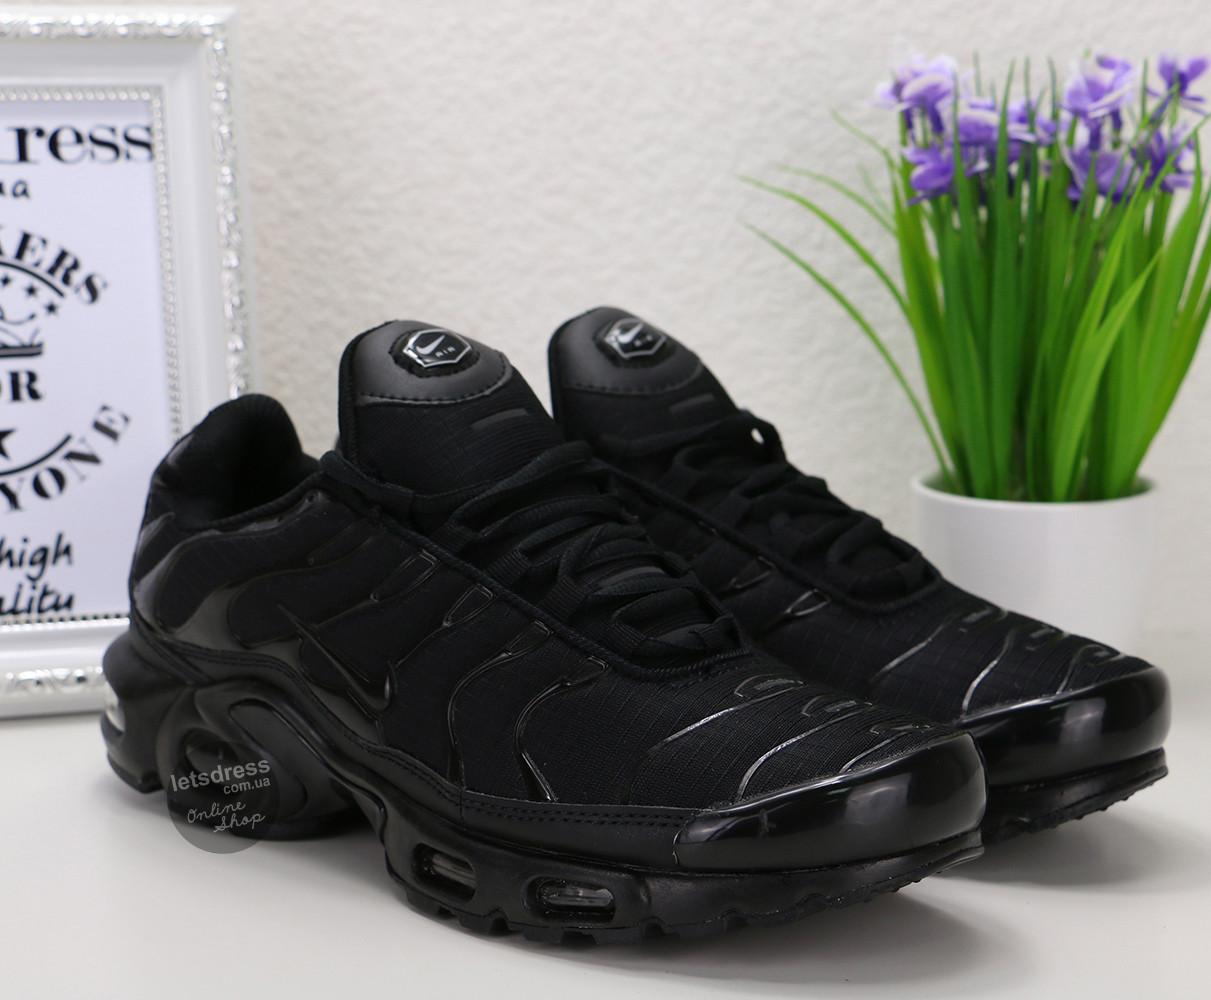 c25b50de Кроссовки мужские Nike Air Max TN Plus black | Найк Аир Макс ТН плюс черные